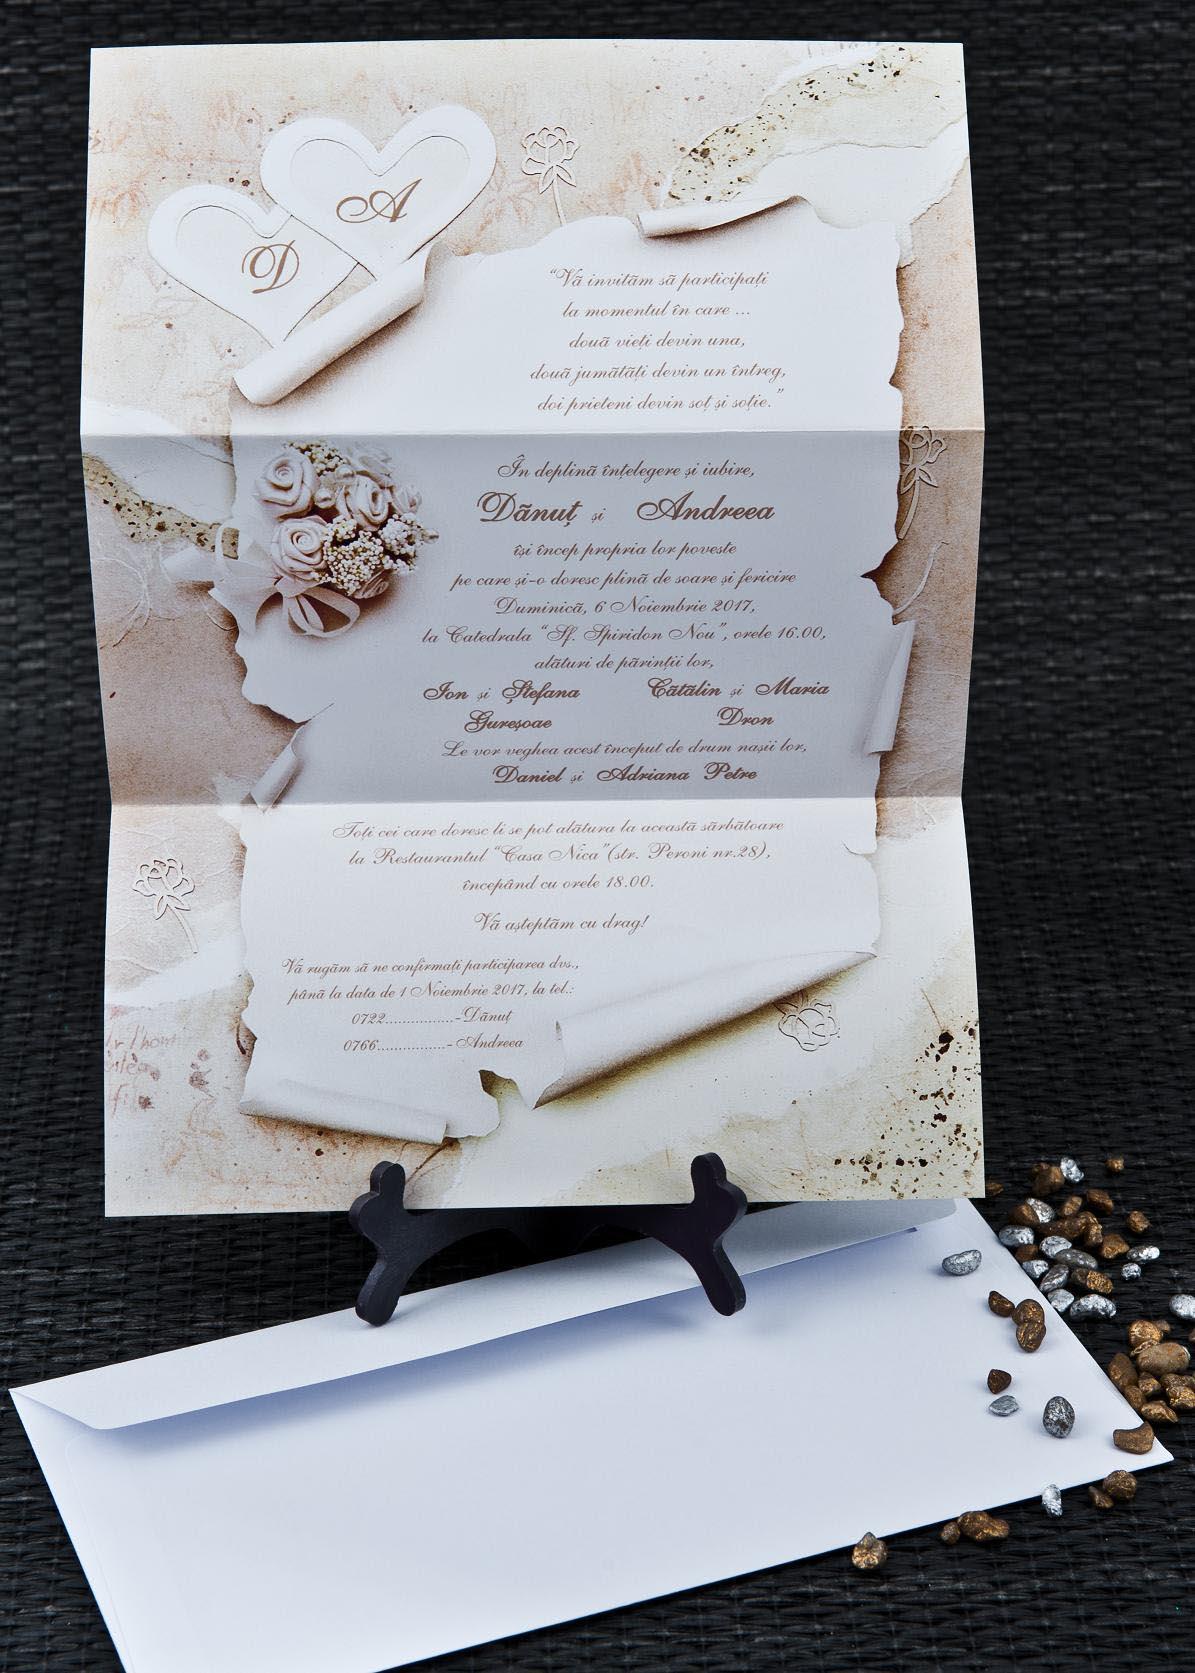 Papirus Invitatii Nunta Invitatii Botez Marturii Plicuri Bani